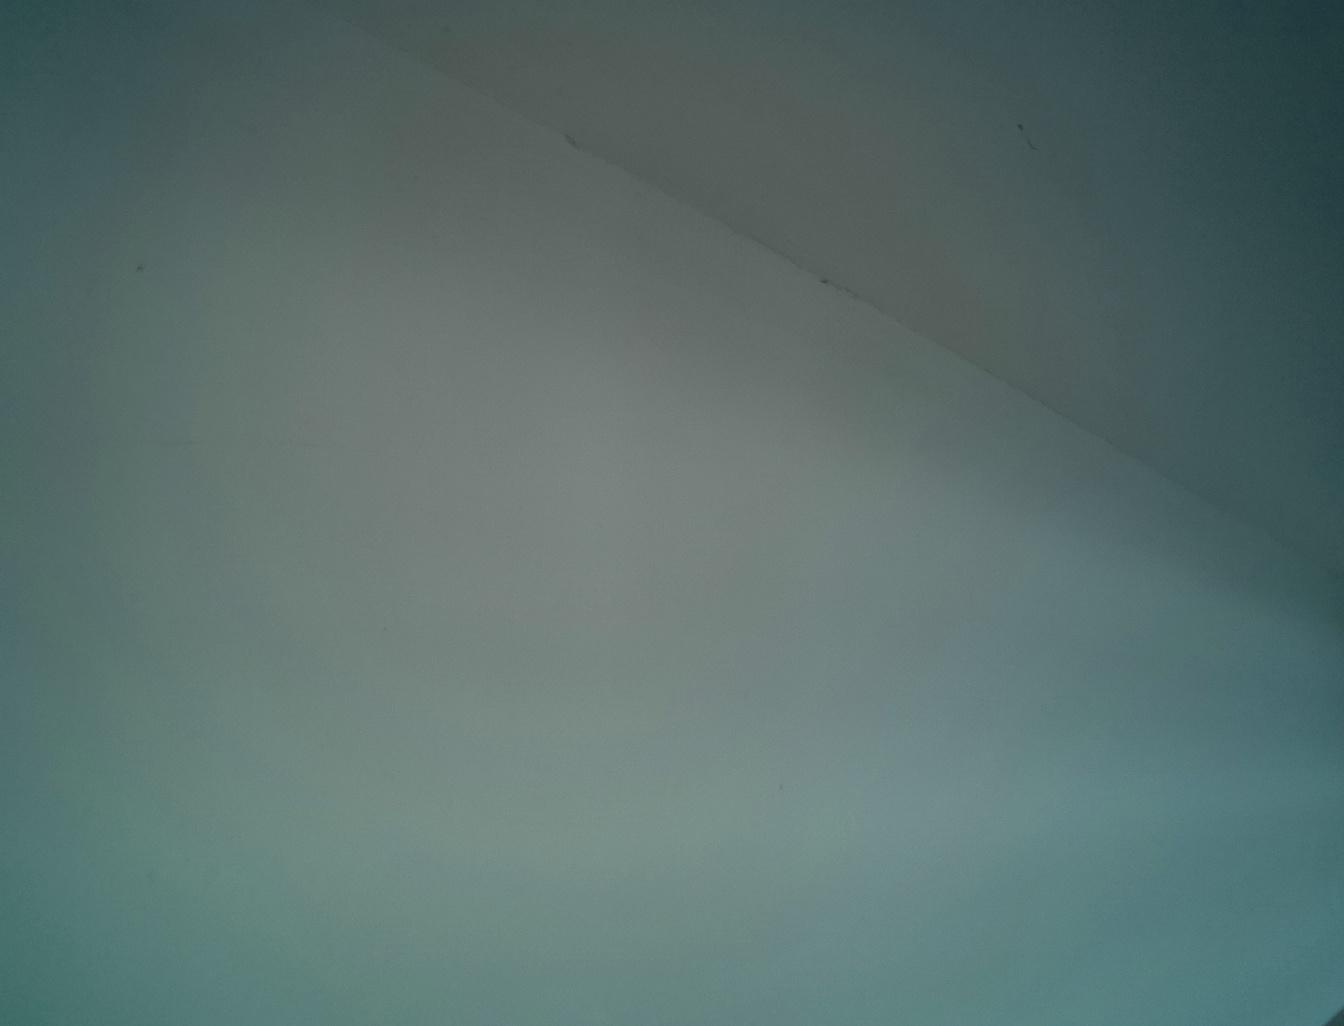 camera1-2021-09-03-13-00-17